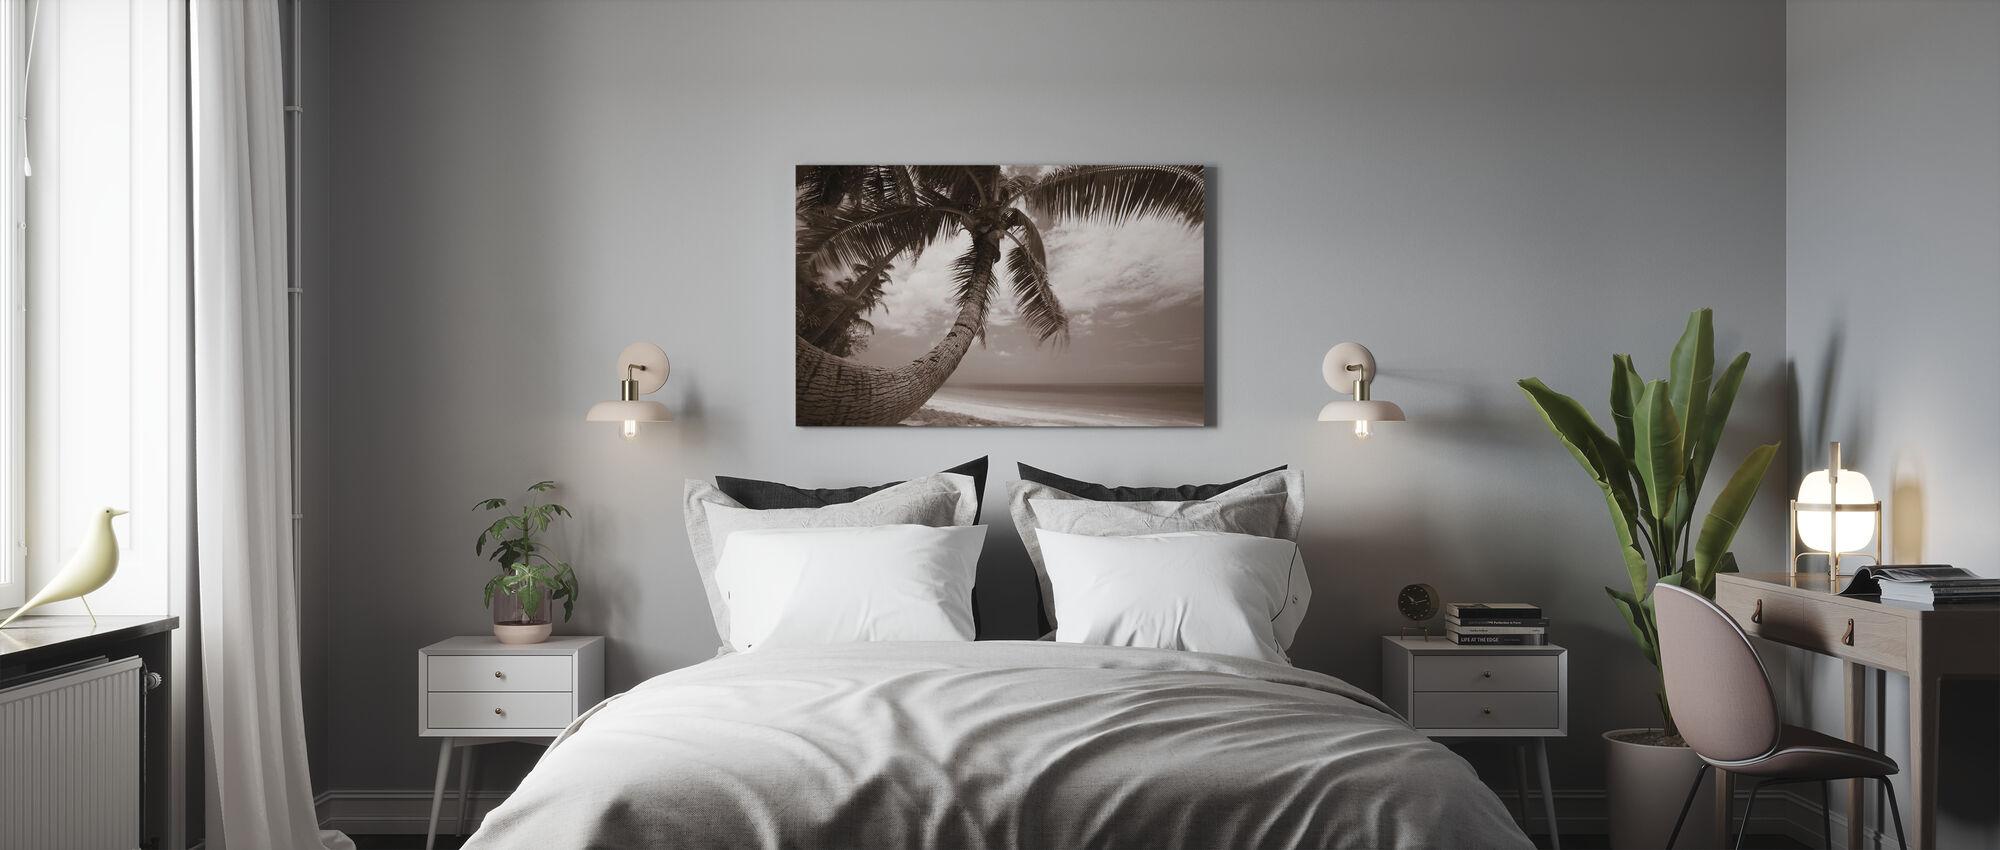 Ronde vorm Palm - Sepia - Canvas print - Slaapkamer